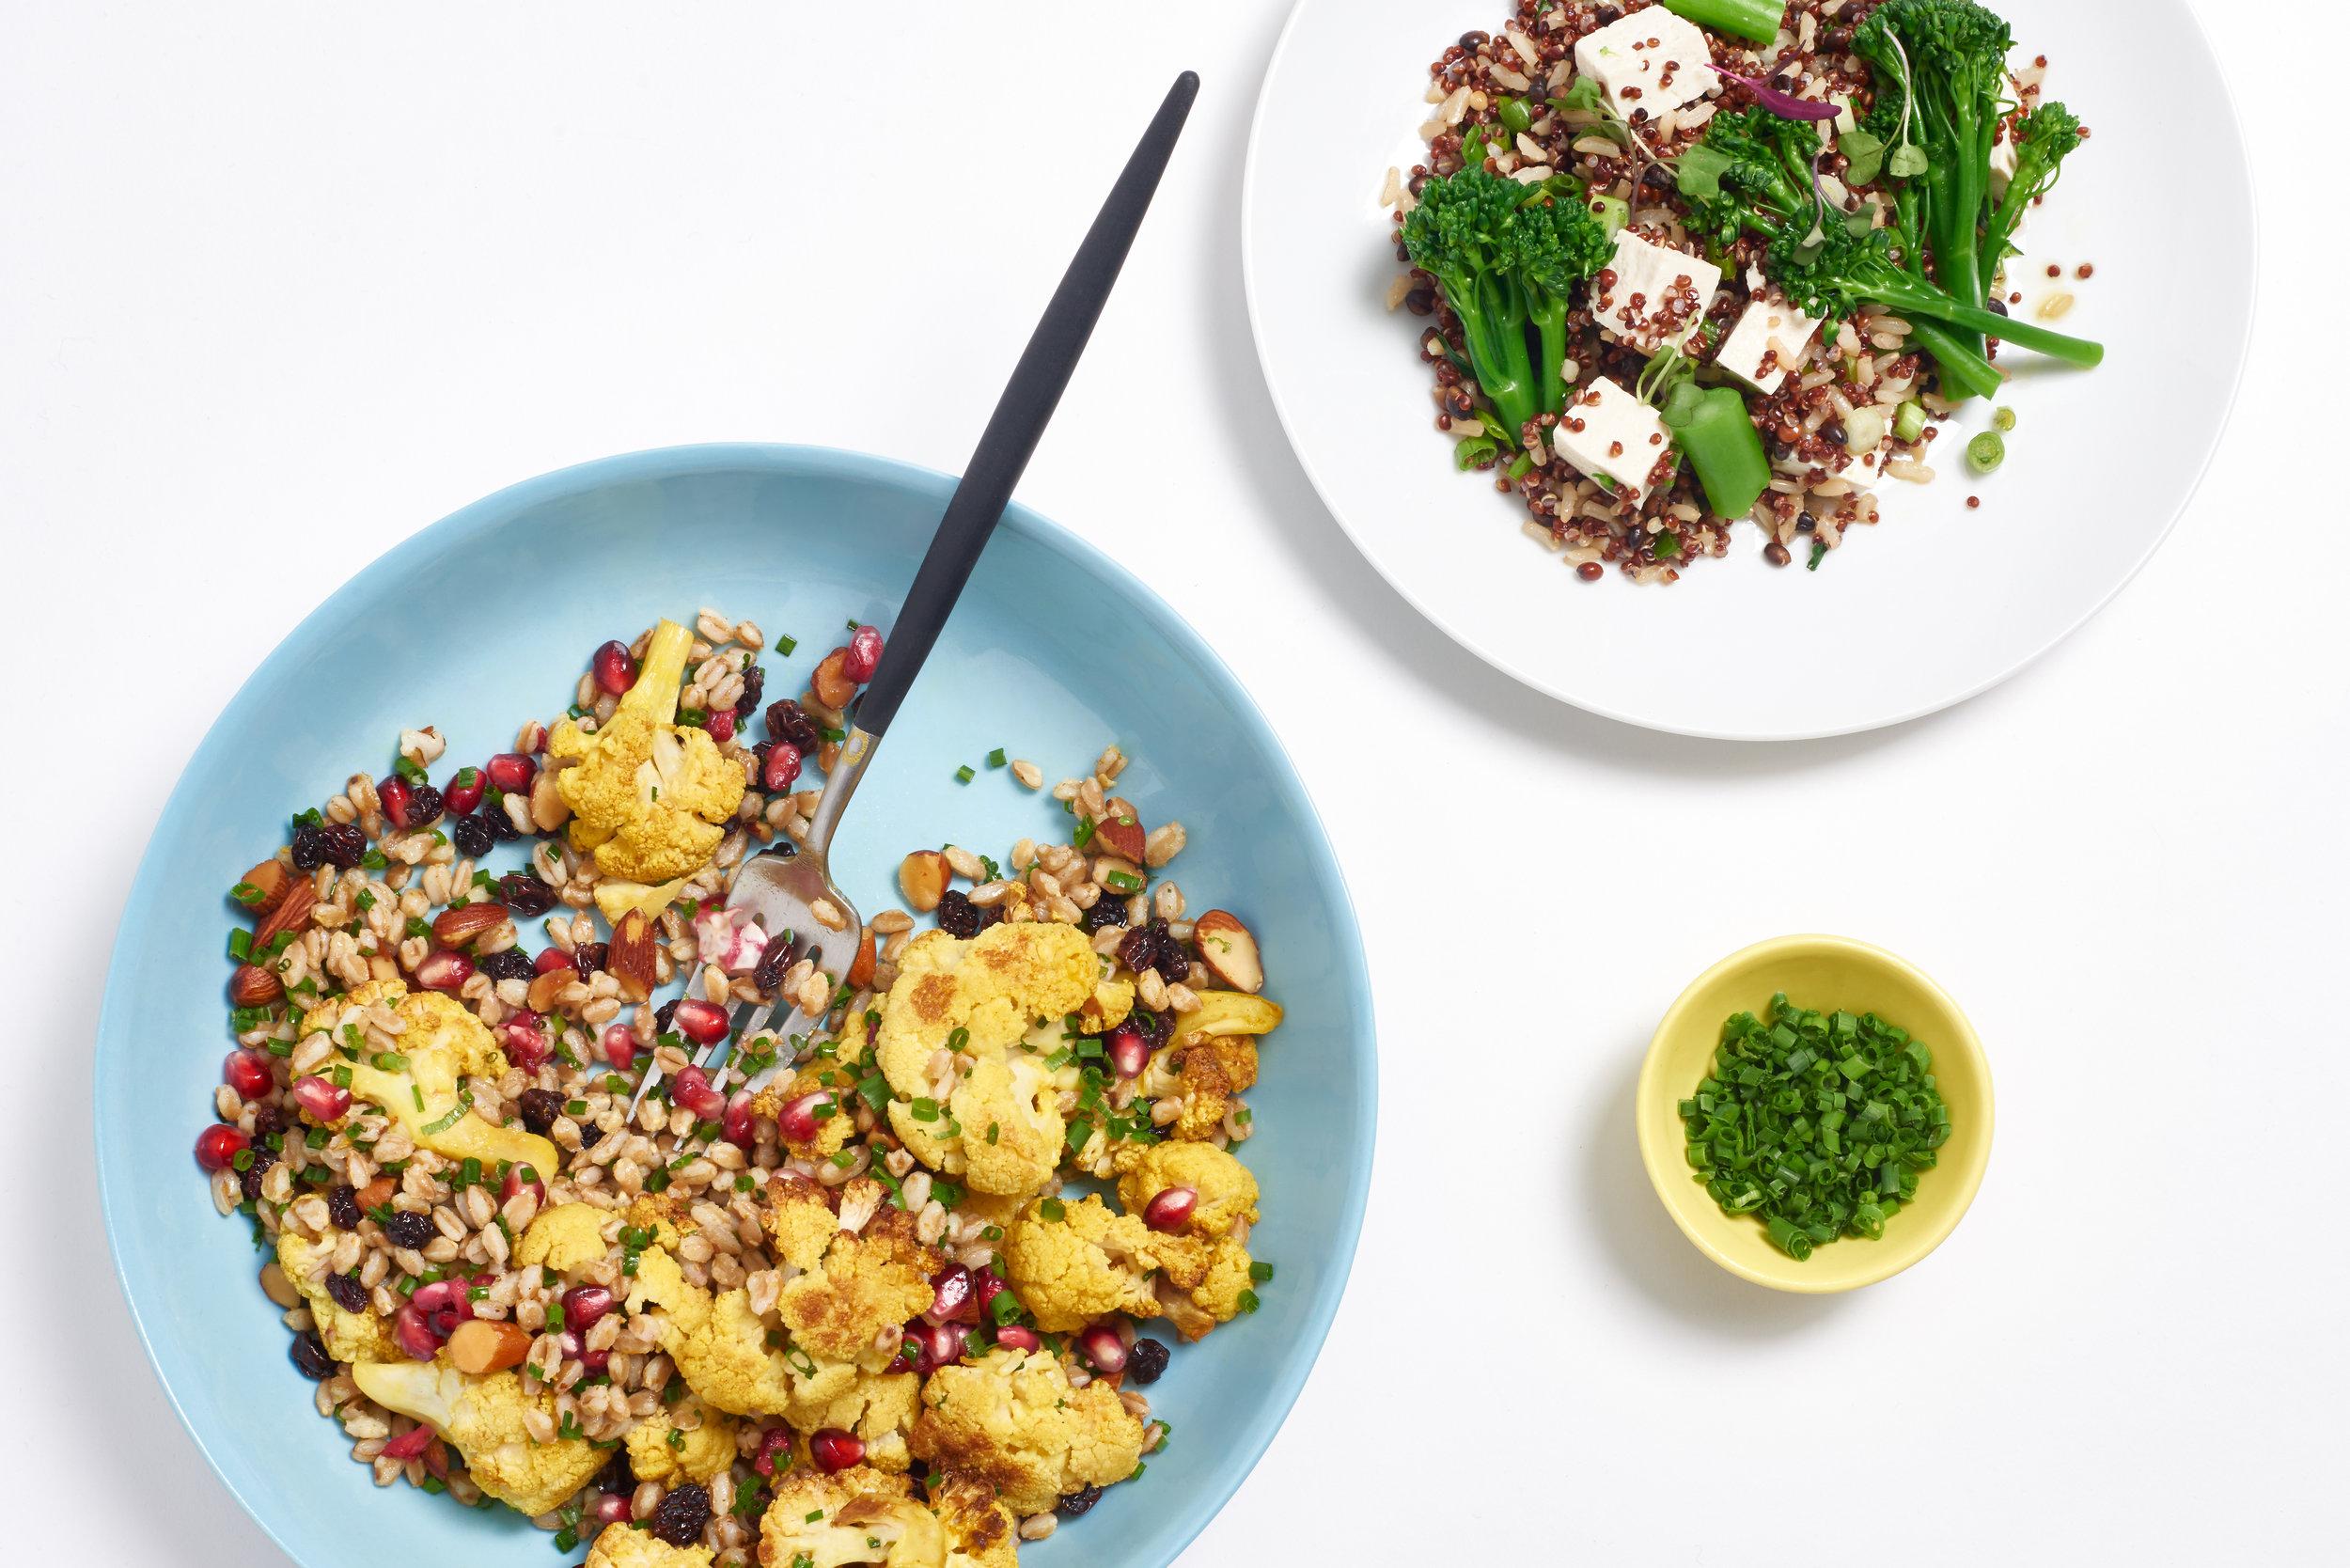 Curried cauliflower farro + broccolini tofu red quinoa